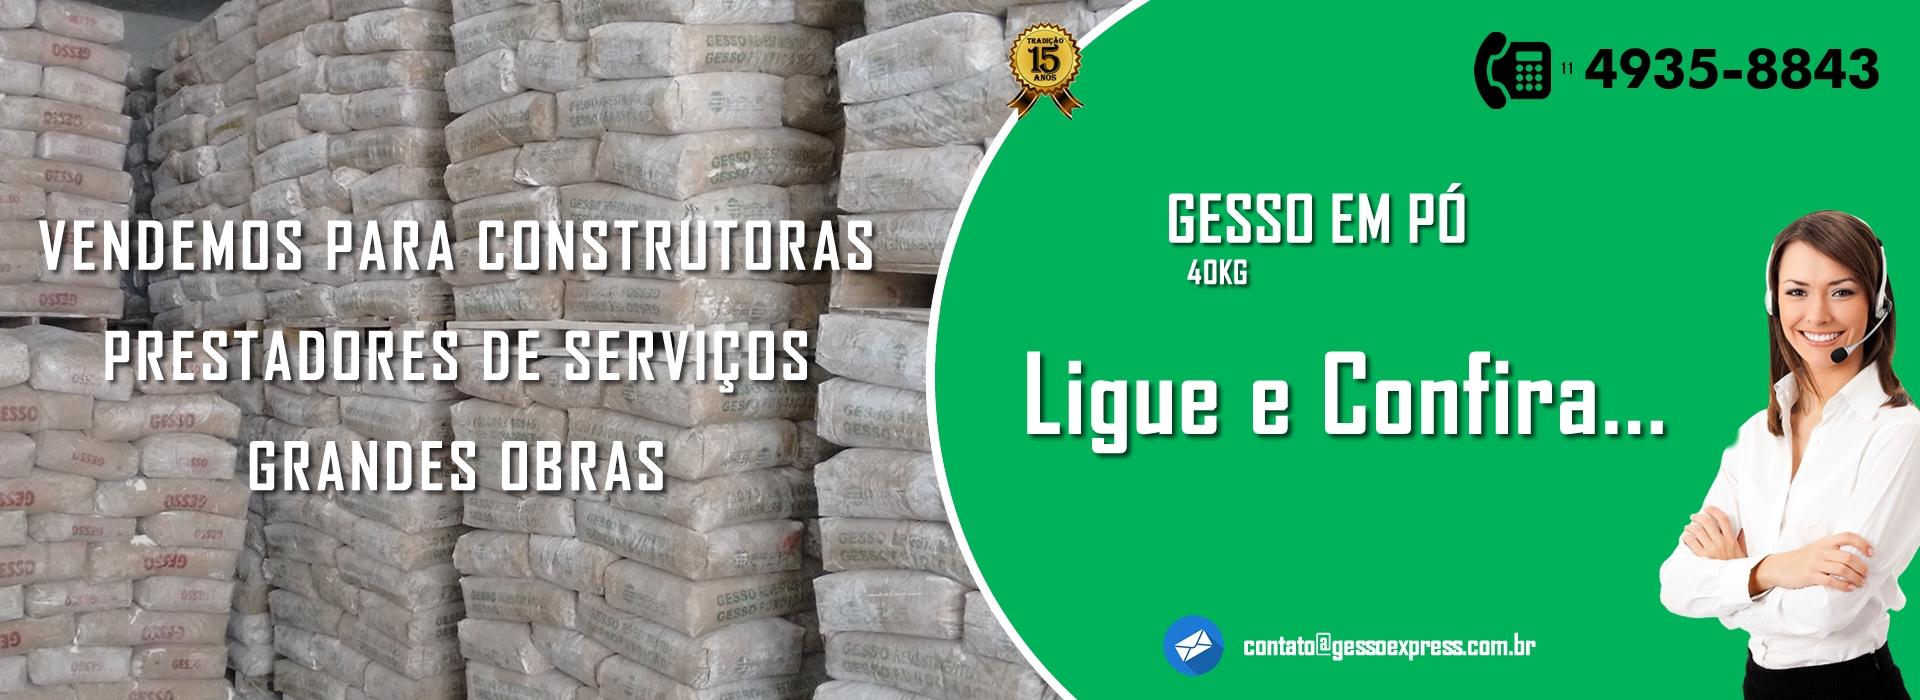 gessoexpress-forro-de-gesso-com-sanca-aberta